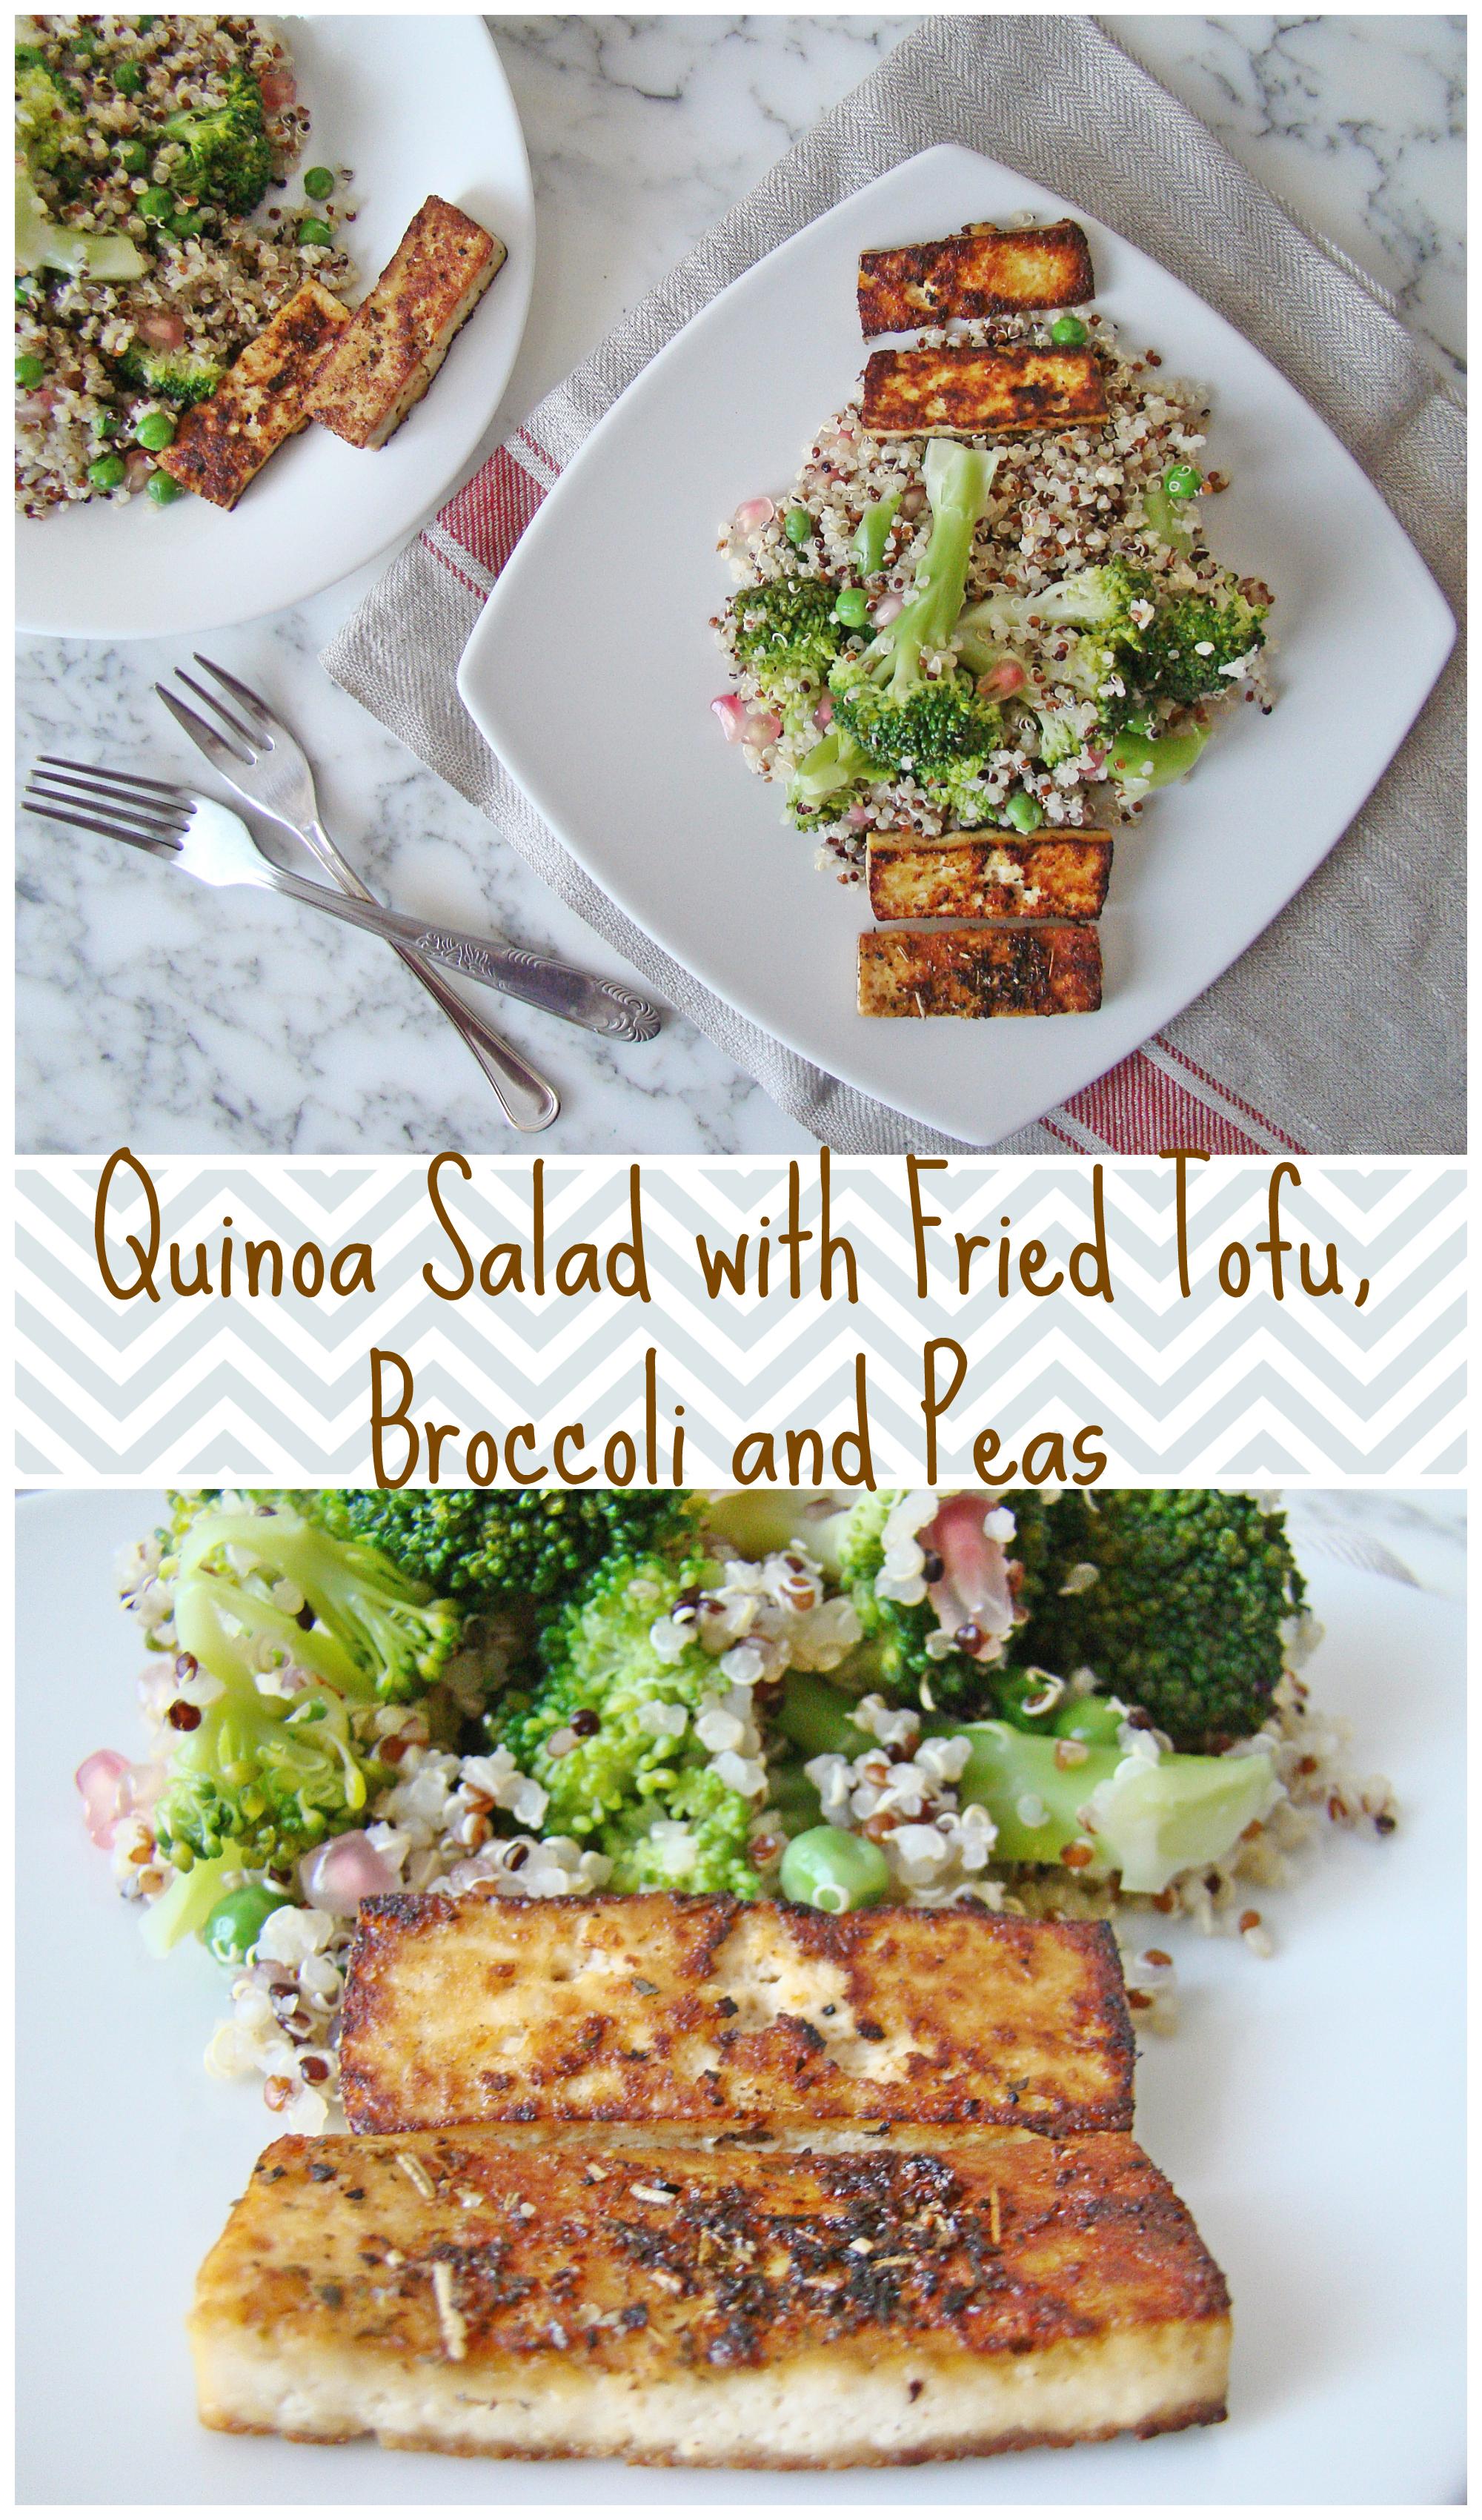 quinoa-salad-with-fried-tofu-broccoli-and-peas